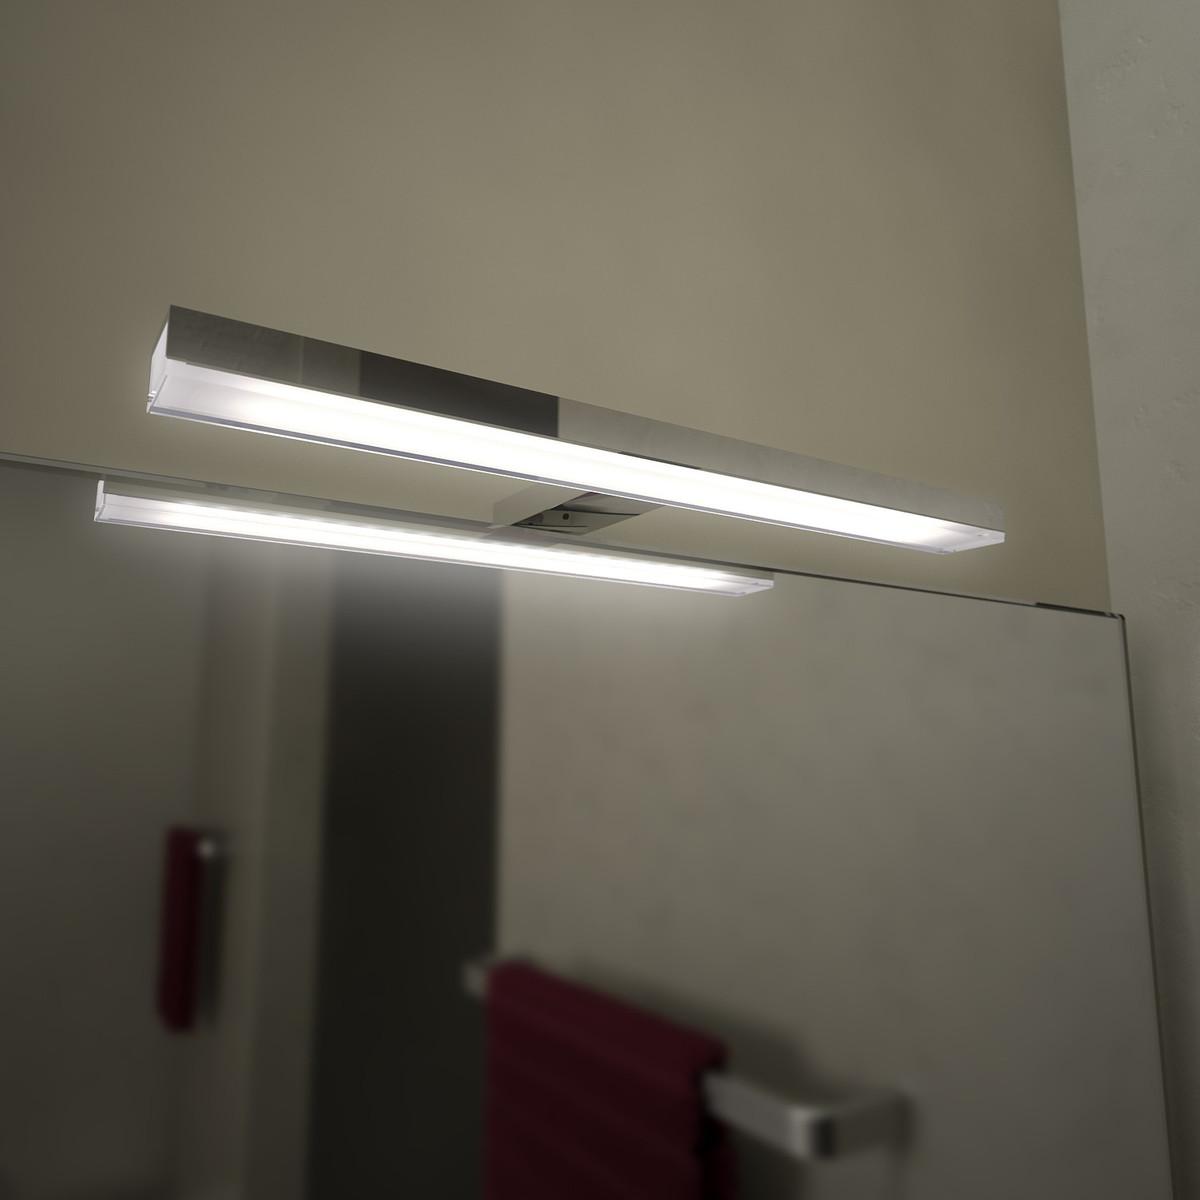 LED Spiegel / Spiegelschrank Leuchte - EBIR Esther Bi-LED duo